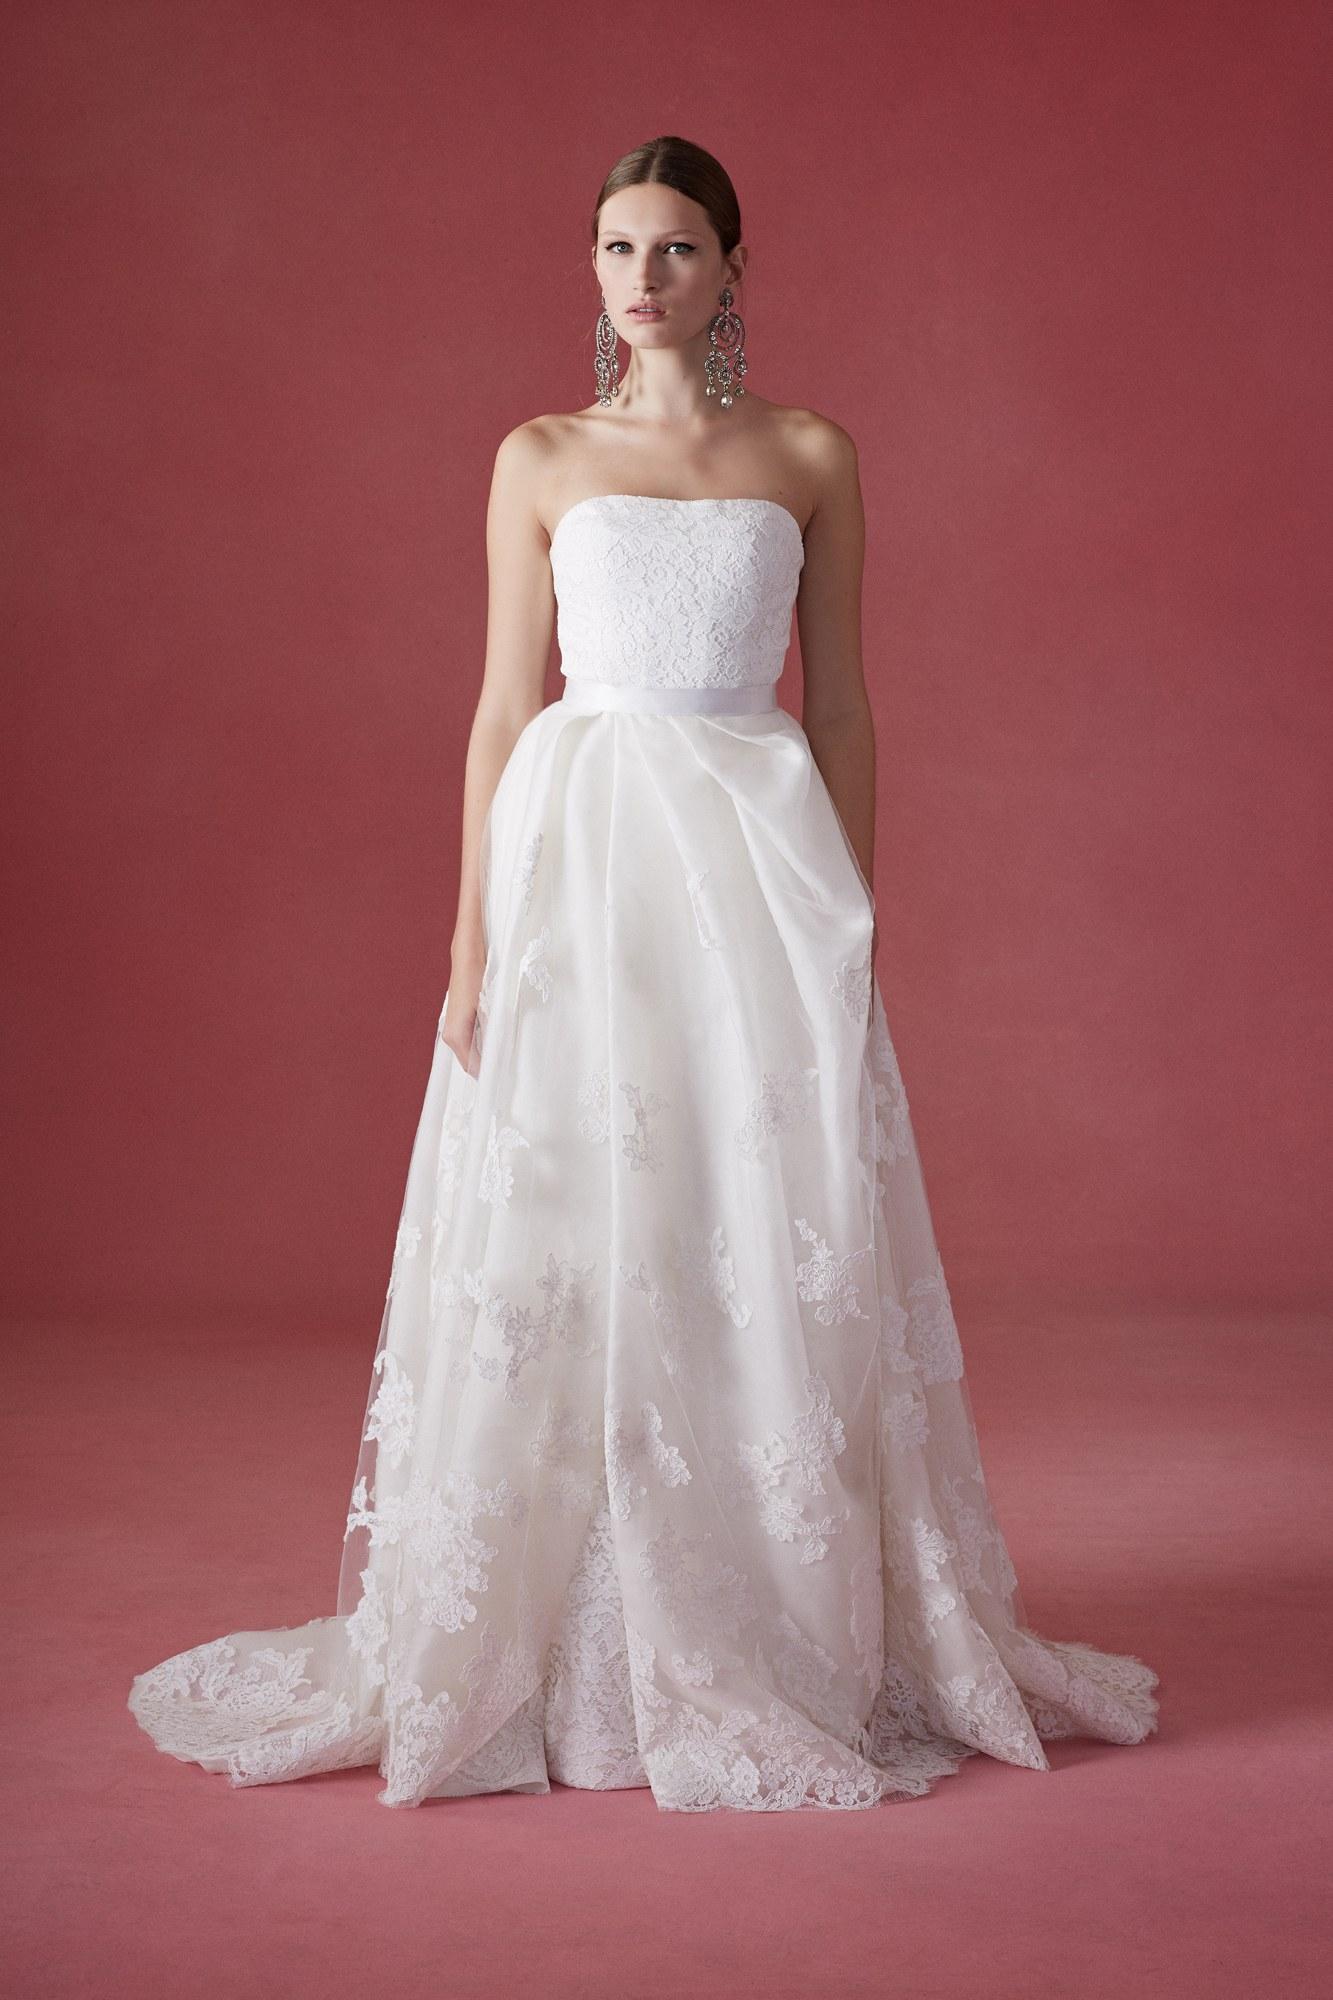 Vestidos De Noiva Tomara Que Caia 65 Modelos Lindos